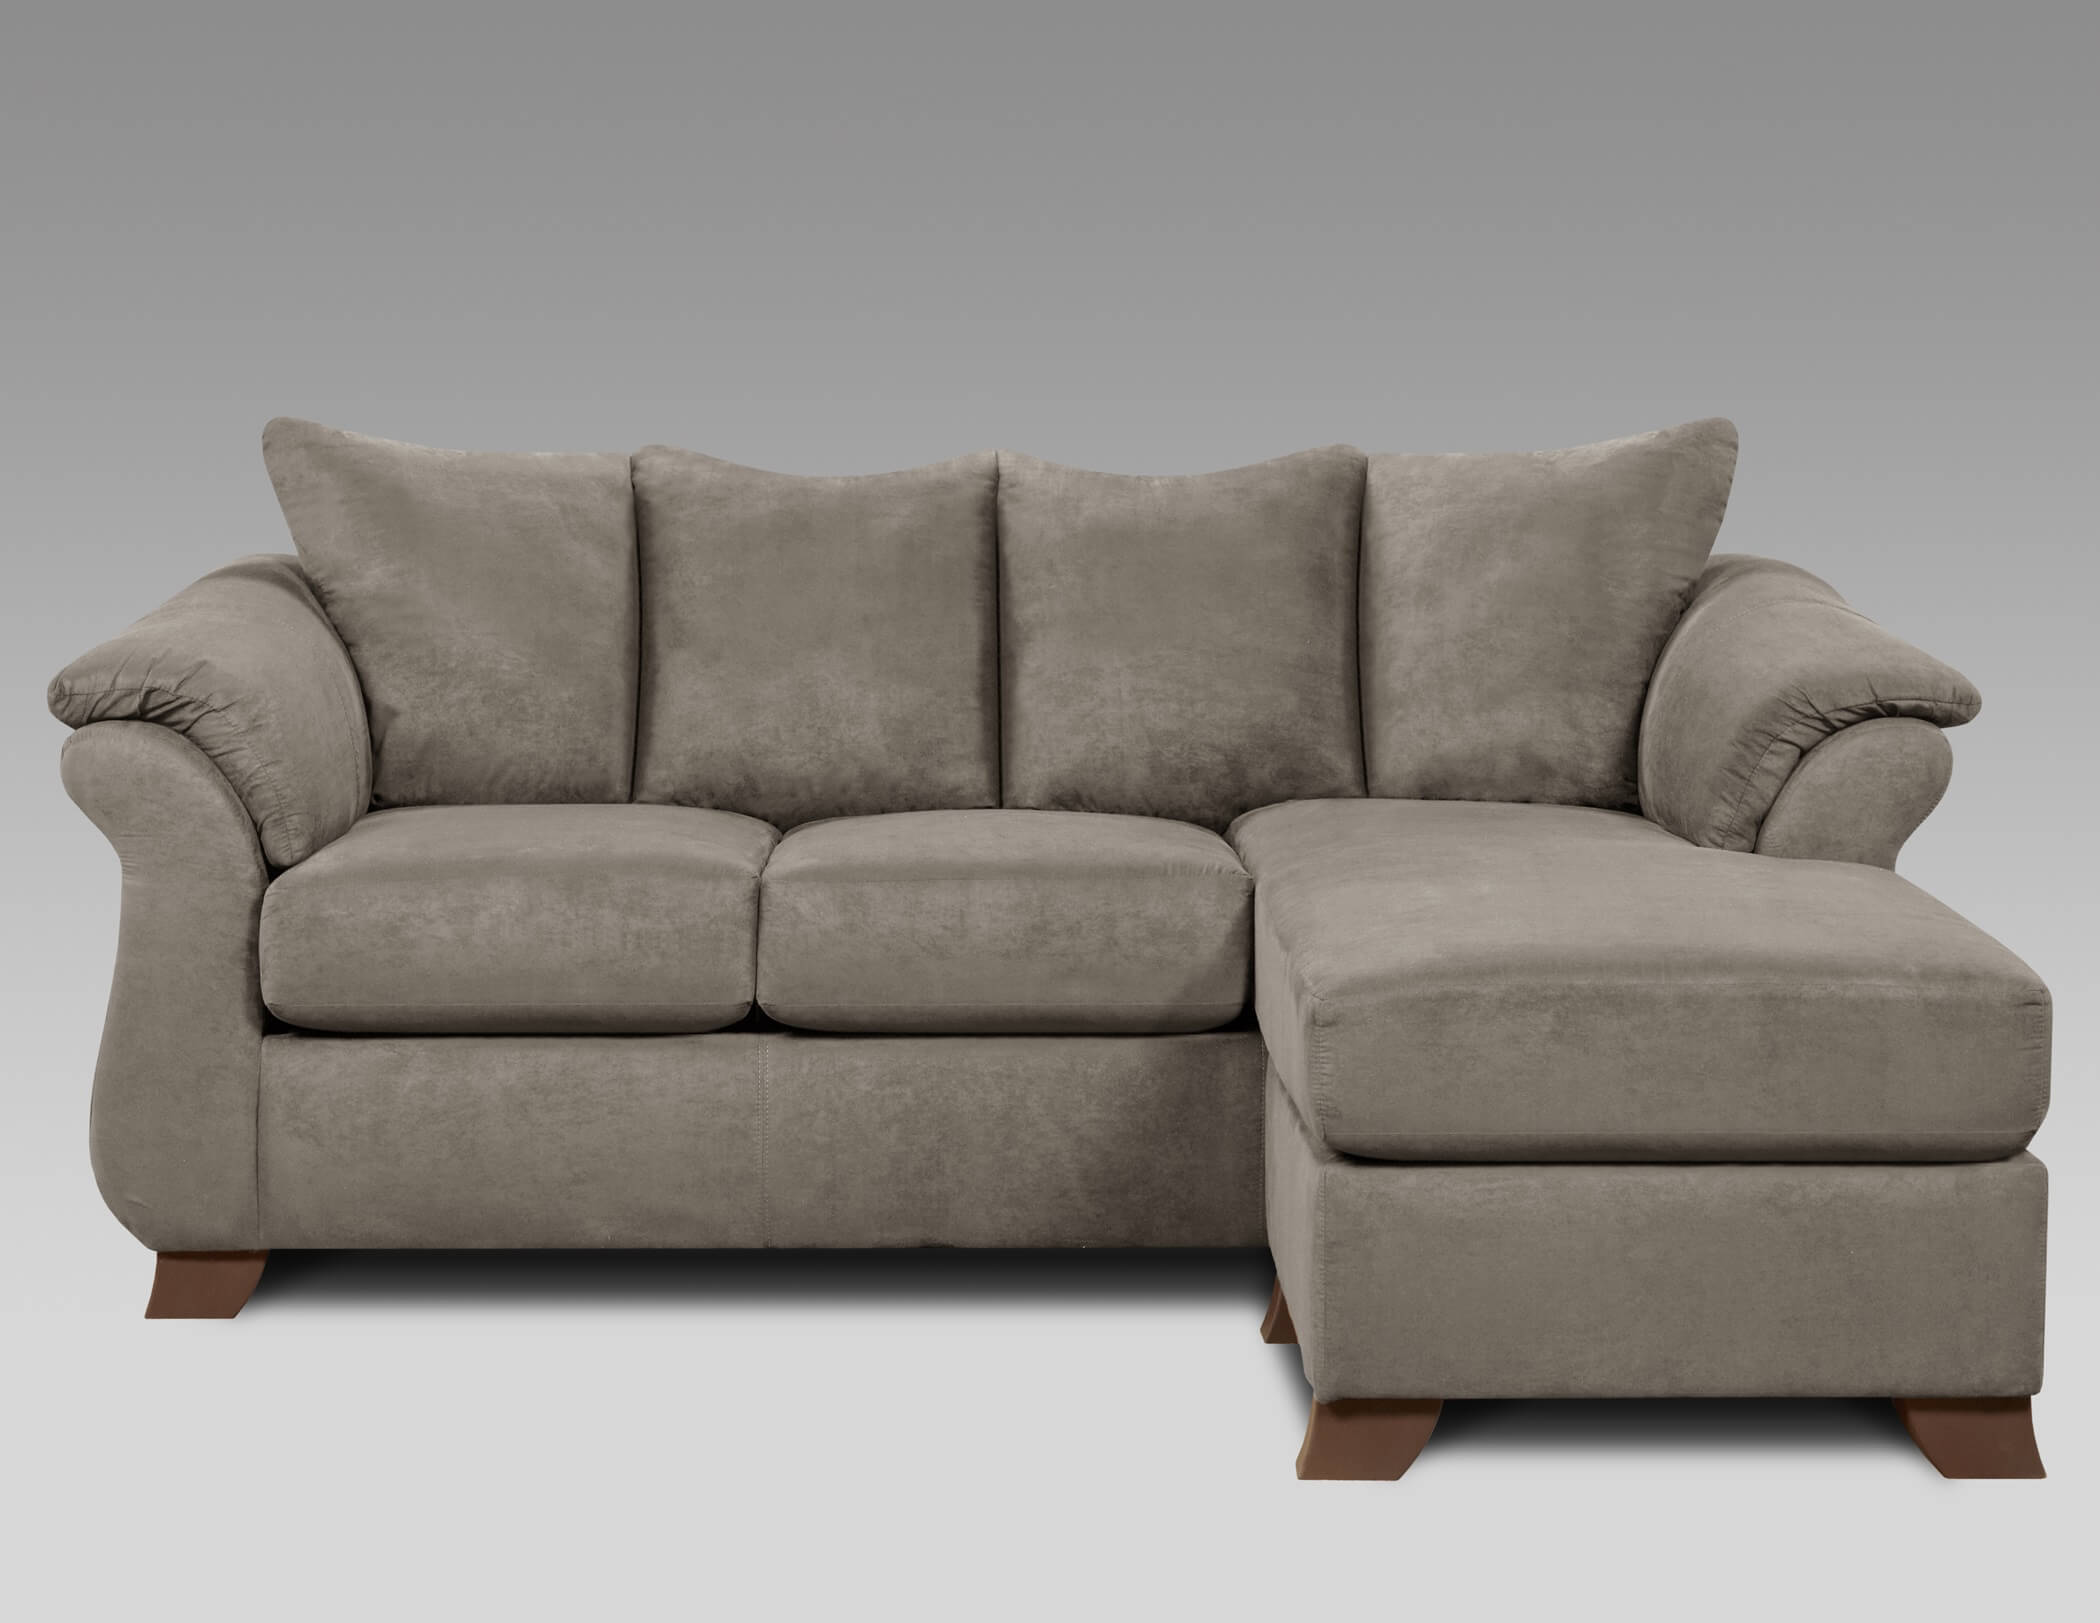 Sensations Grey Sofa Chaise Sectional Sofa Sets